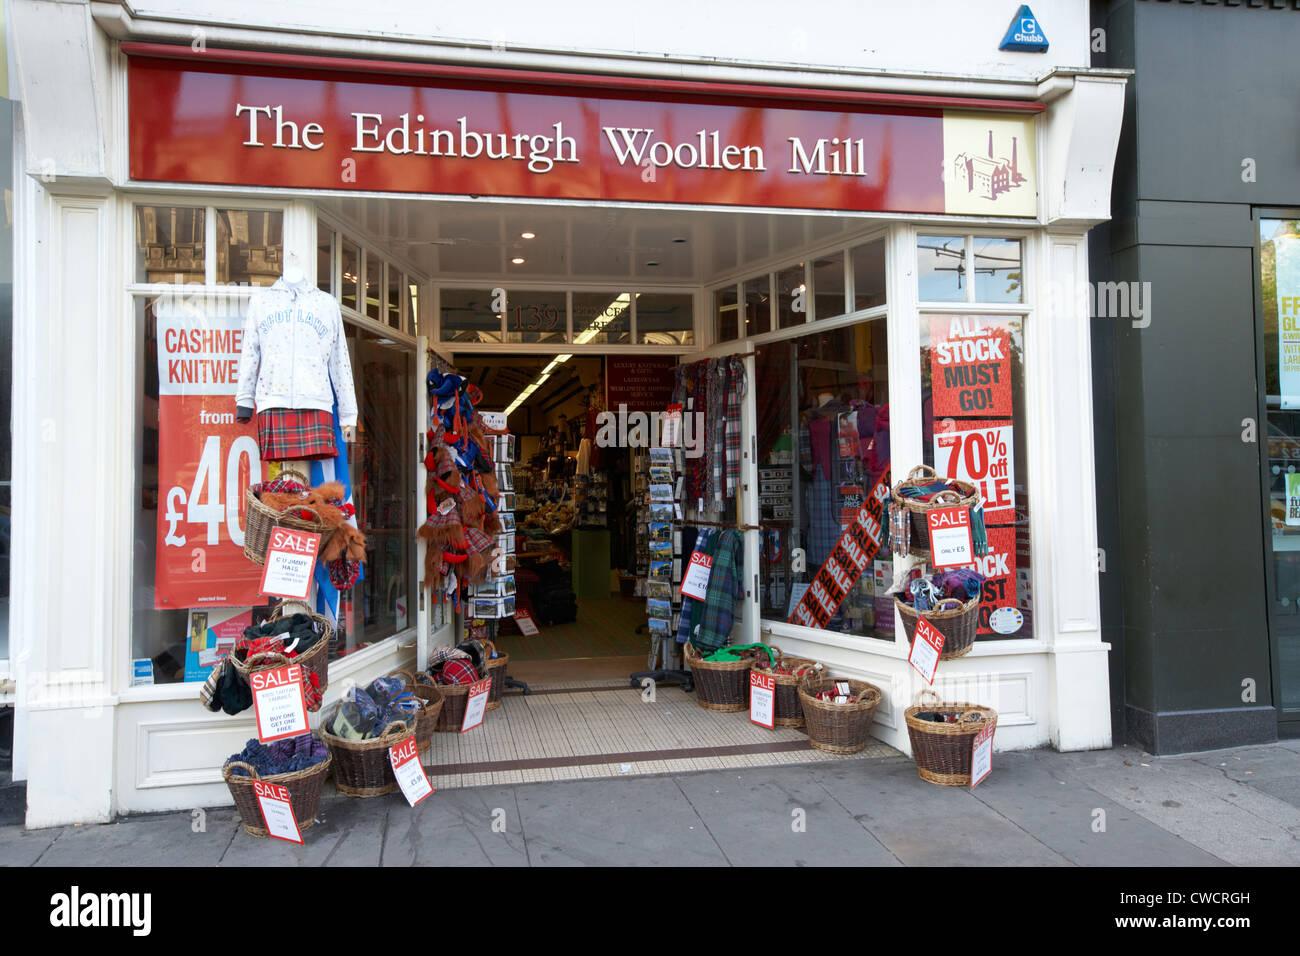 Edinburgh Woollen Mill Shop On Princes Street Edinburgh Scotland Uk Stock Photo Alamy